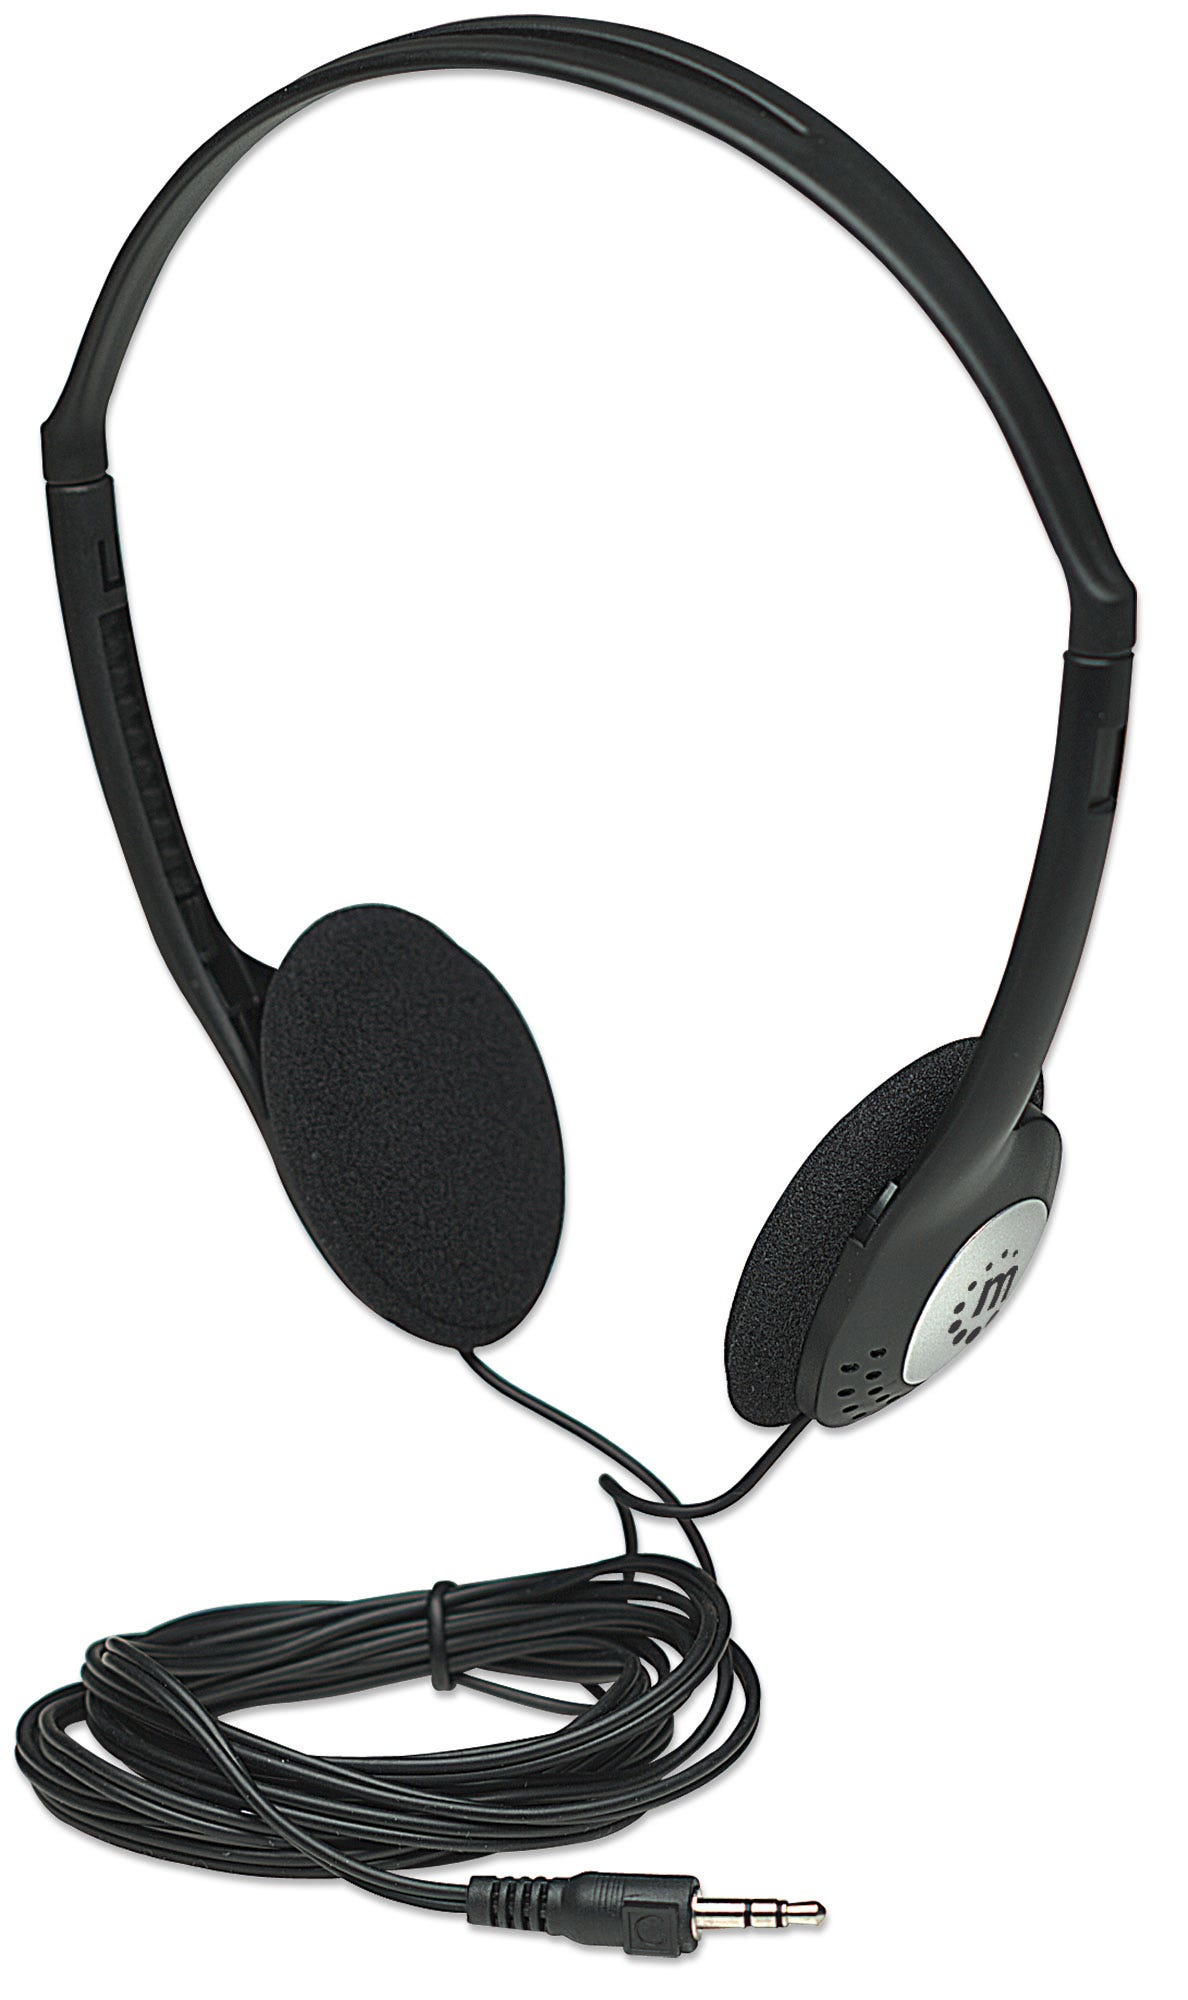 Stereo Headphones Lightweight Design With Adjustable Headband